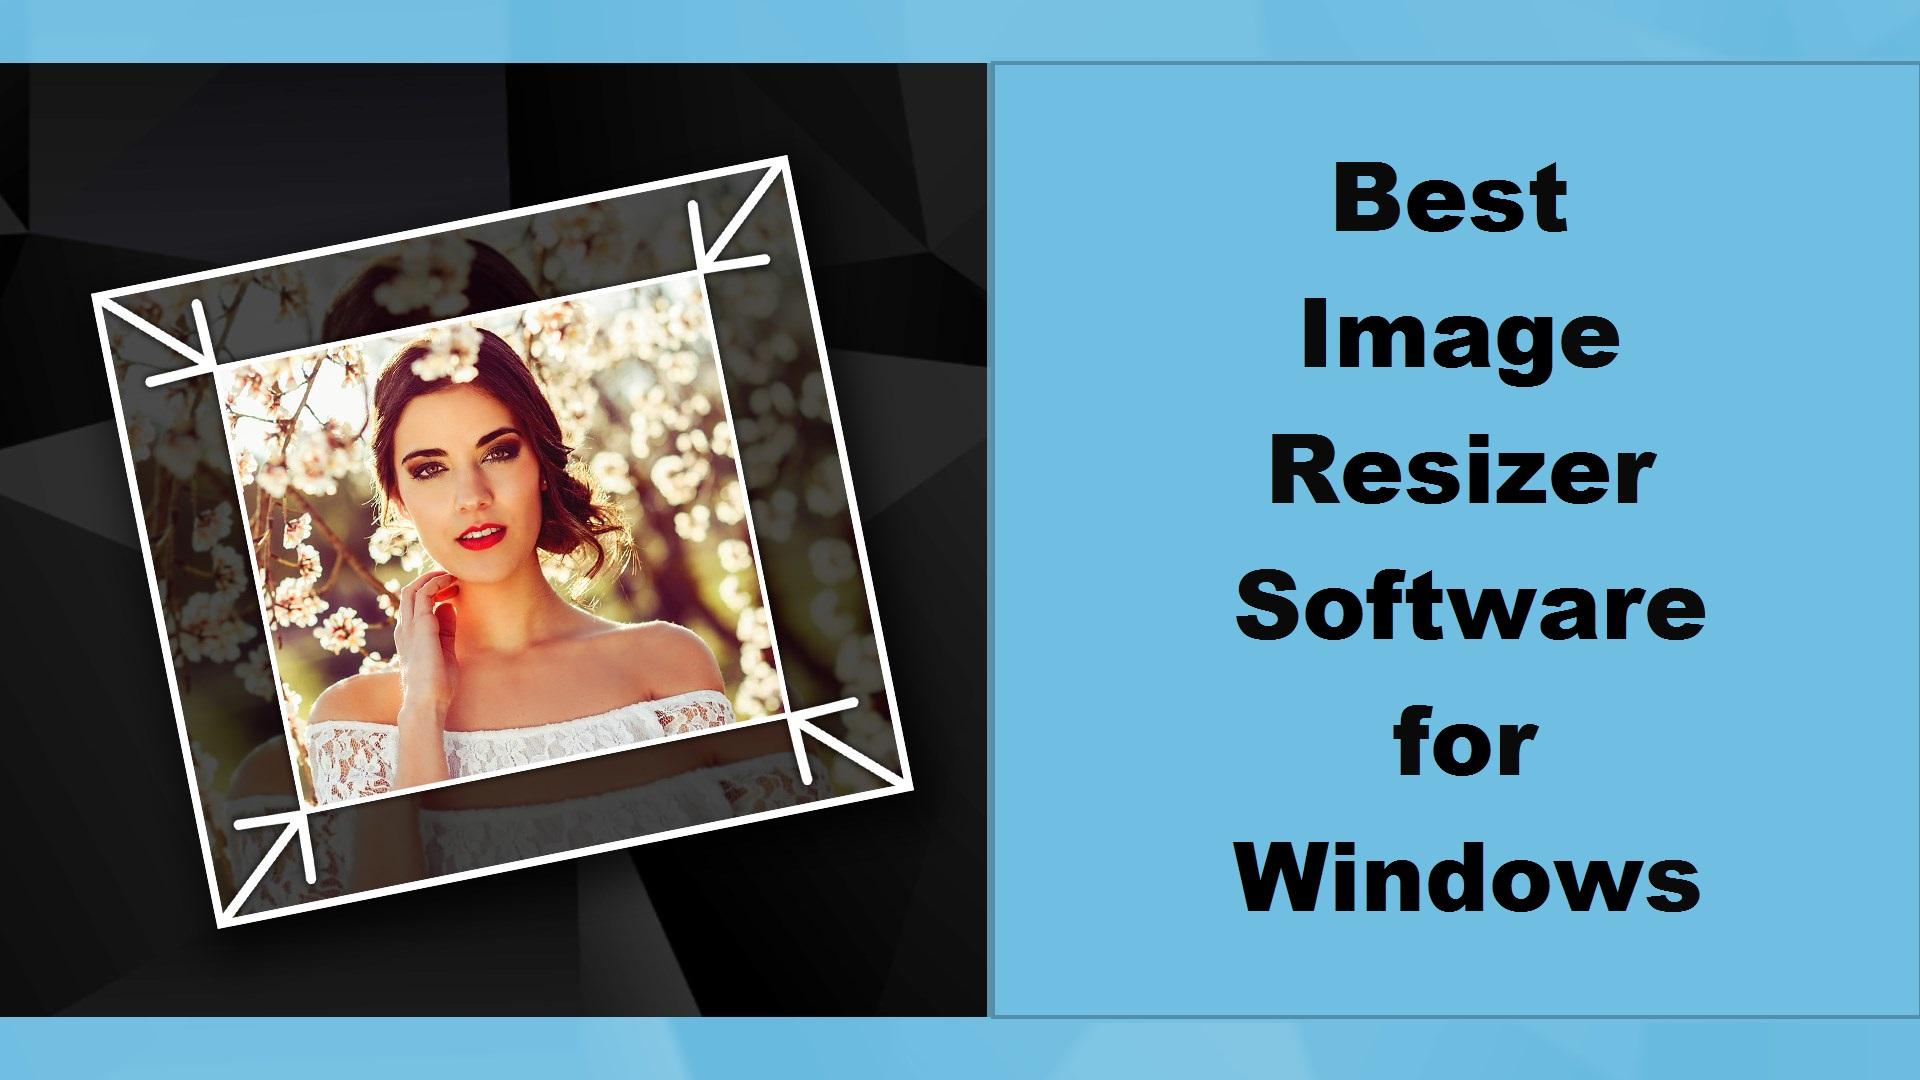 Best Image Resizer Software for Windows